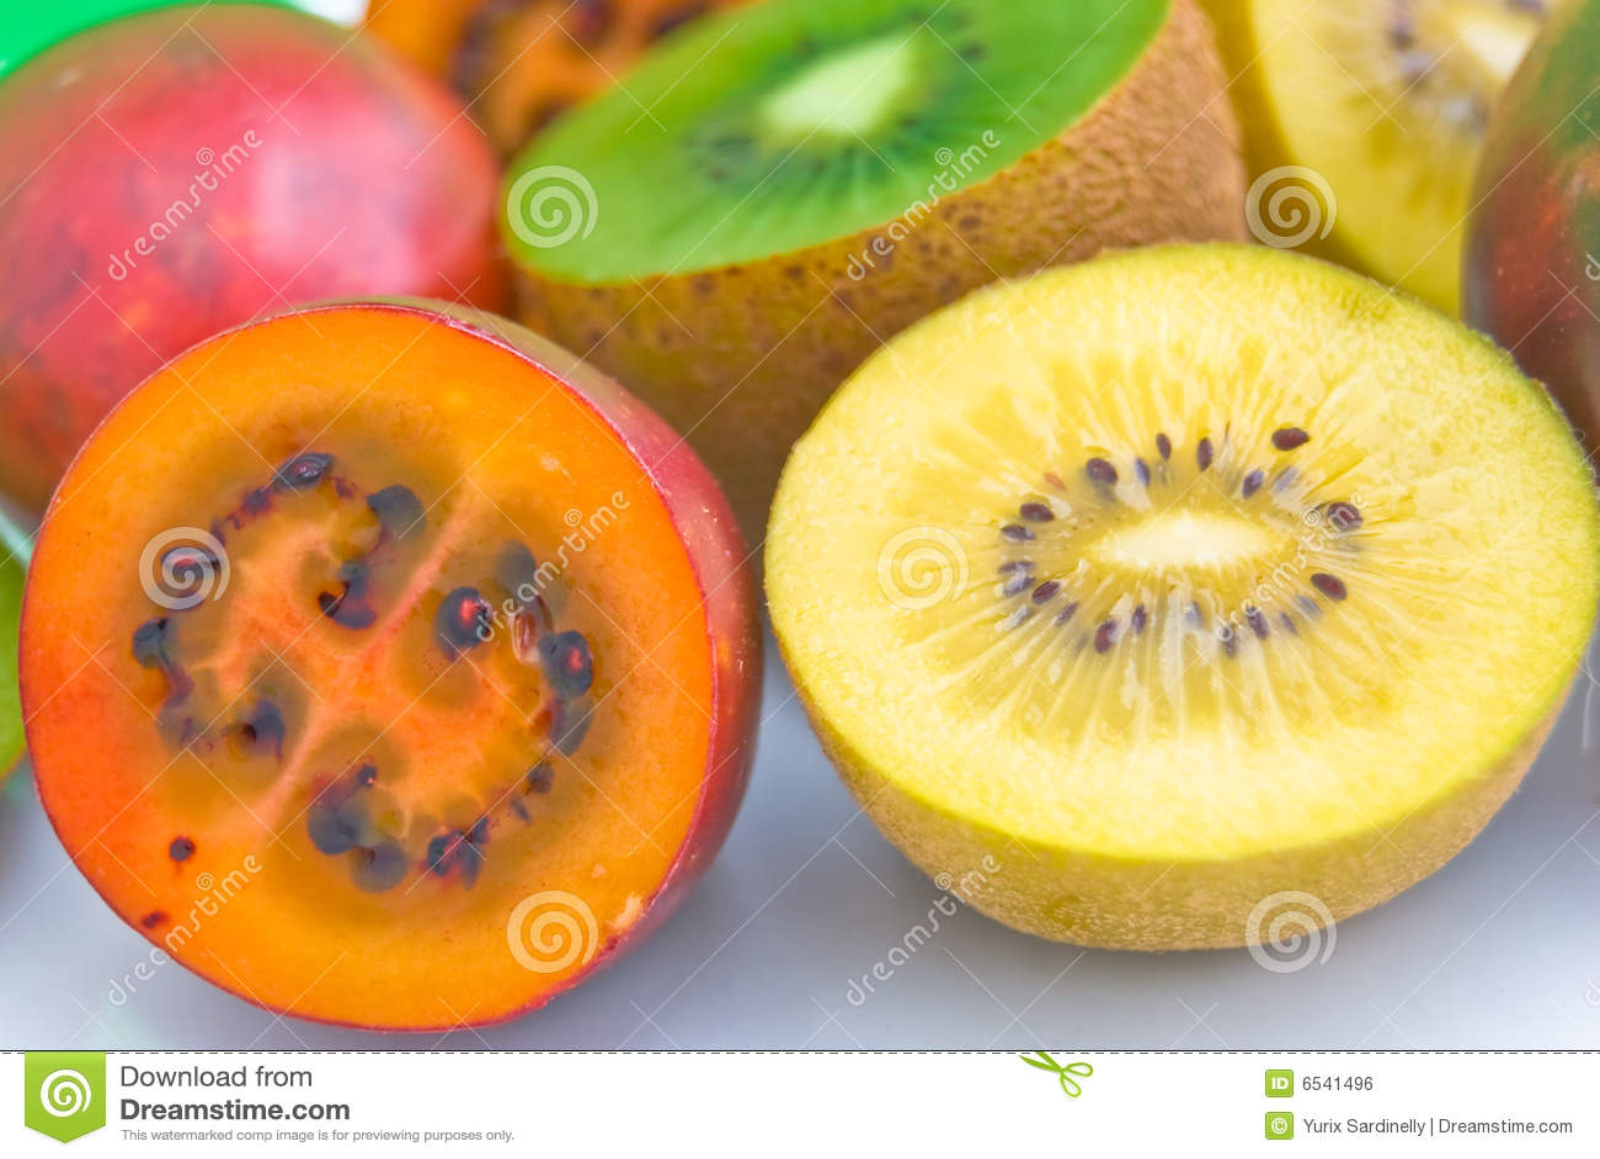 the fruit company golden fruit